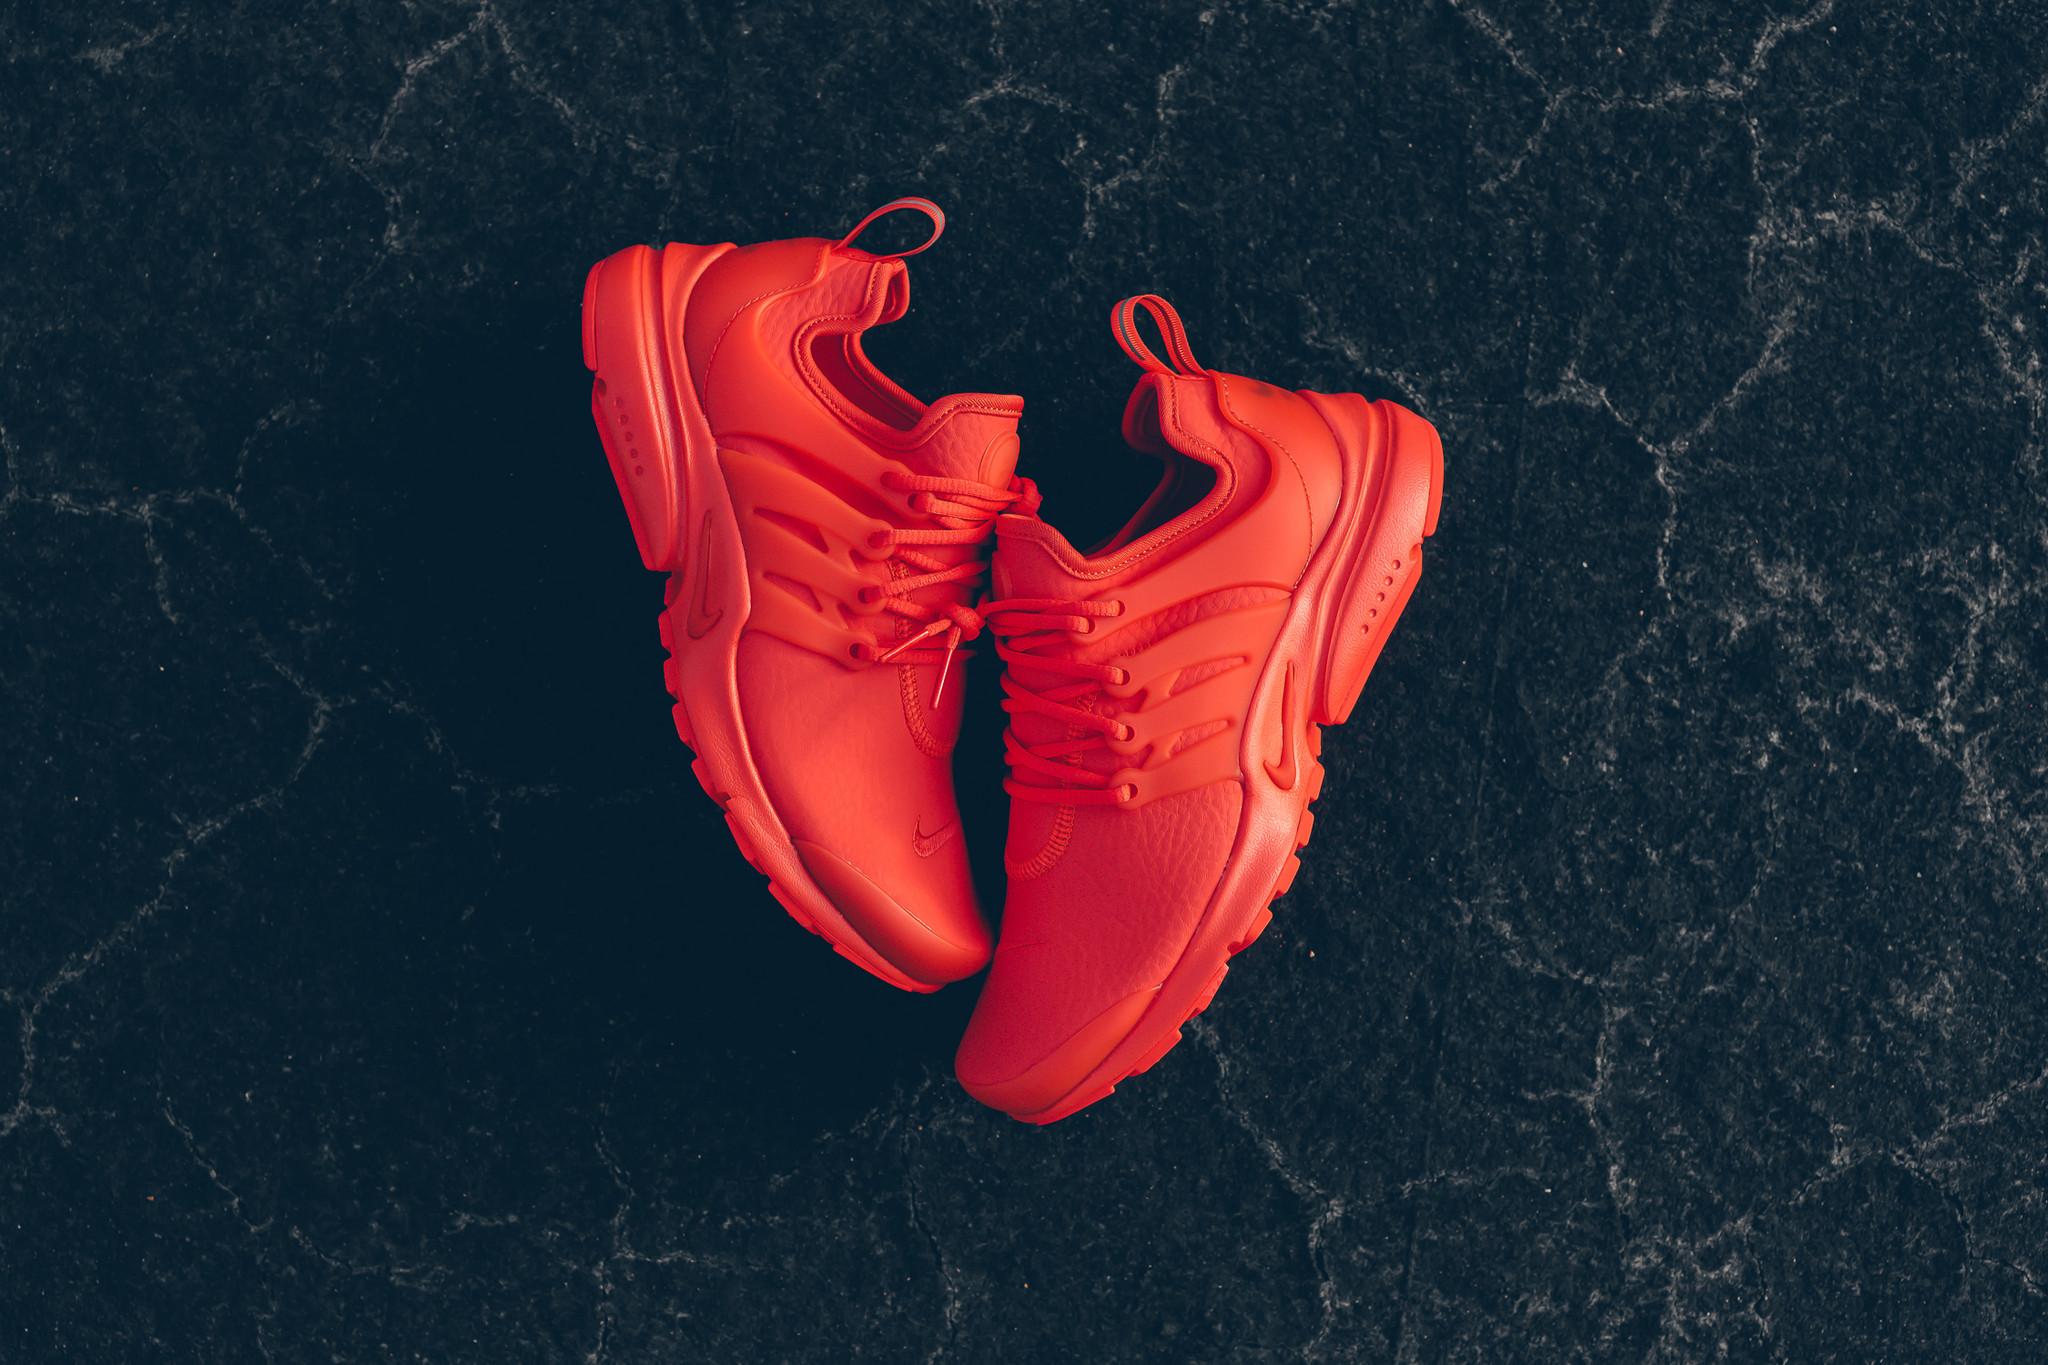 WMNS_Nike_Air_Presto_PRM_Max_Orange_Sneaker_Politics_HypeBeast_1-12